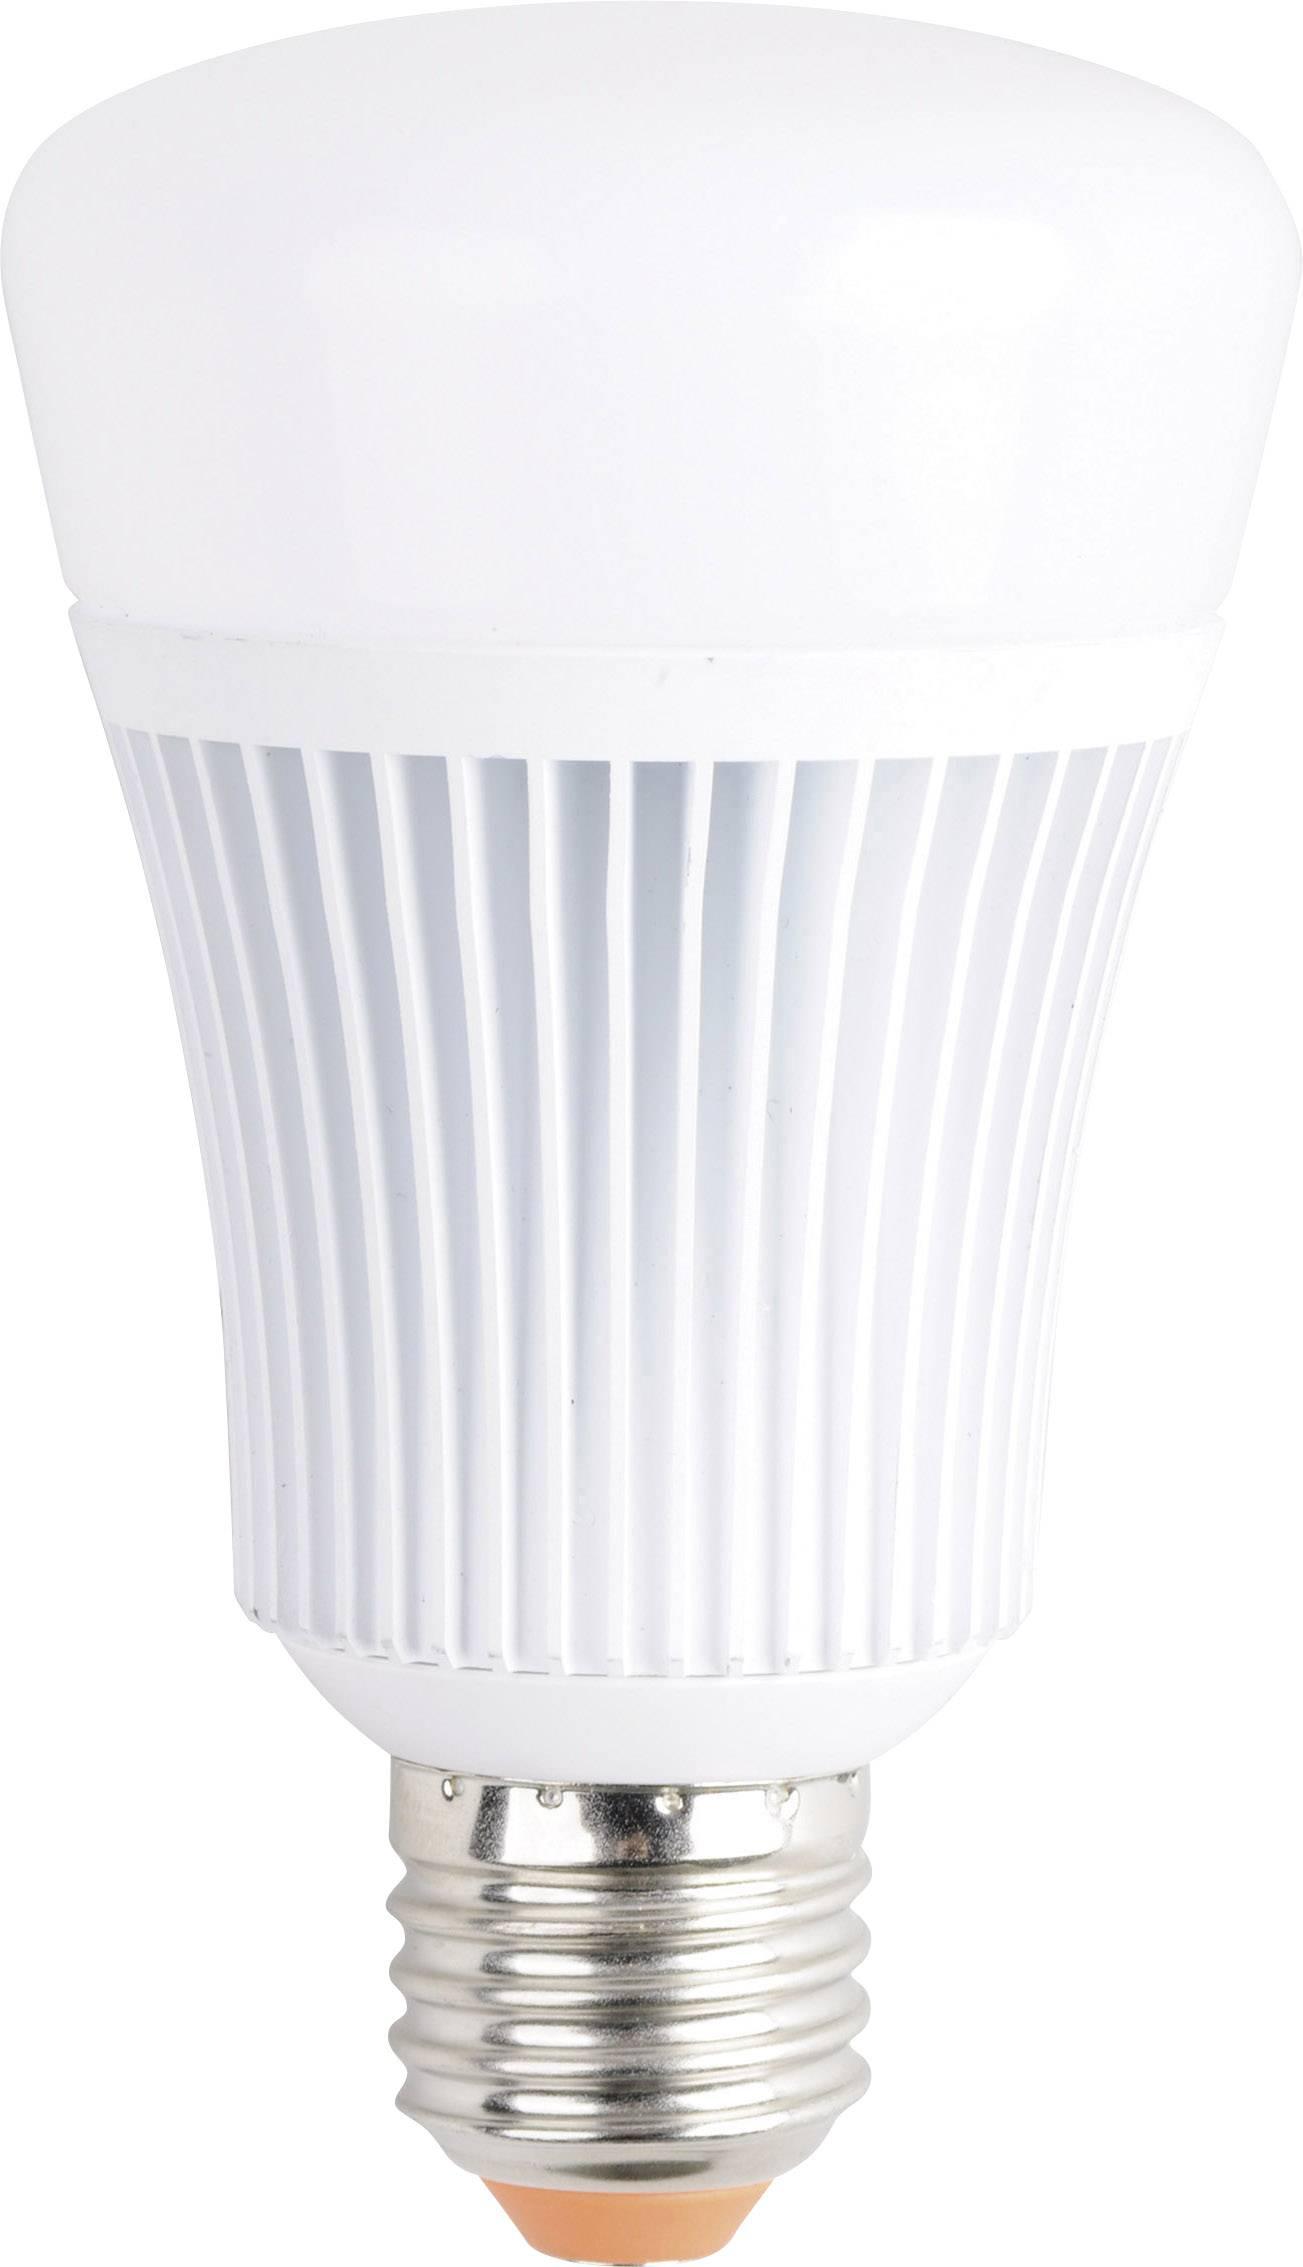 JEDI Lighting LED-lamp E27 Peer 11 W = 60 W RGBW Energielabel: A ...